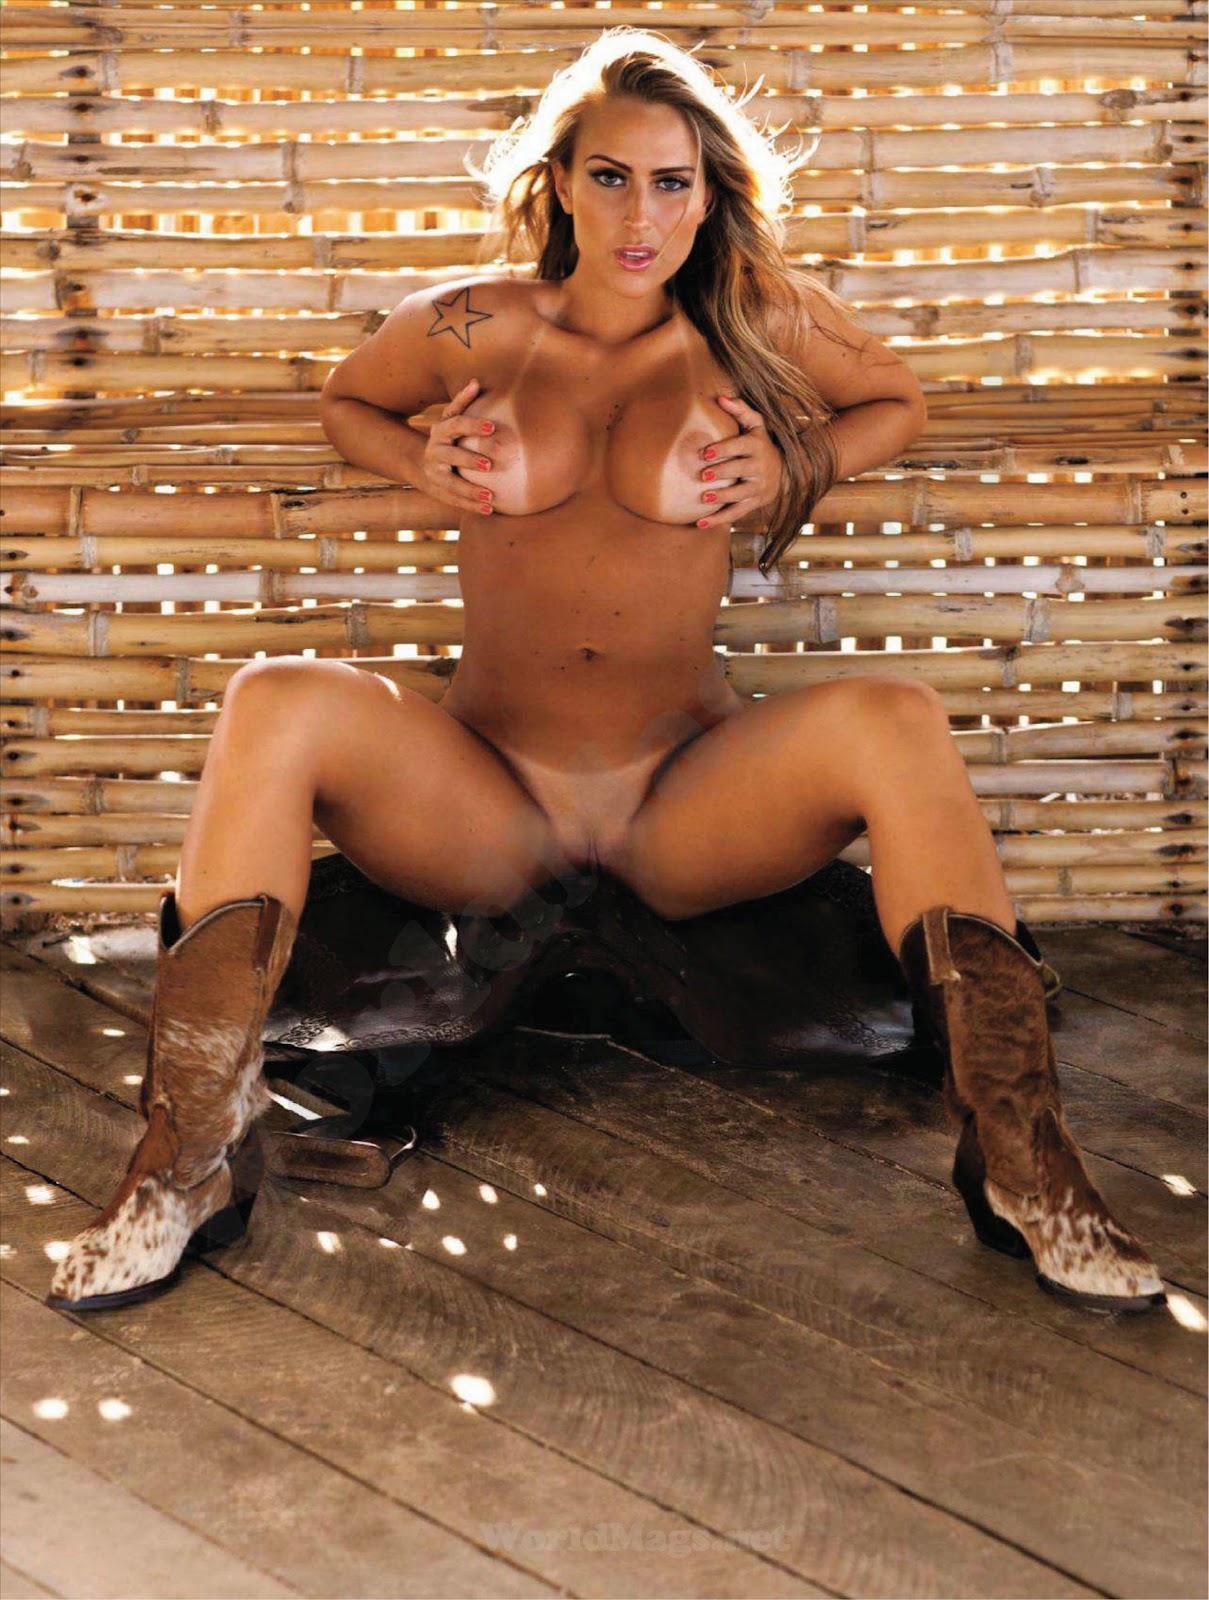 daniel rocha nude photos